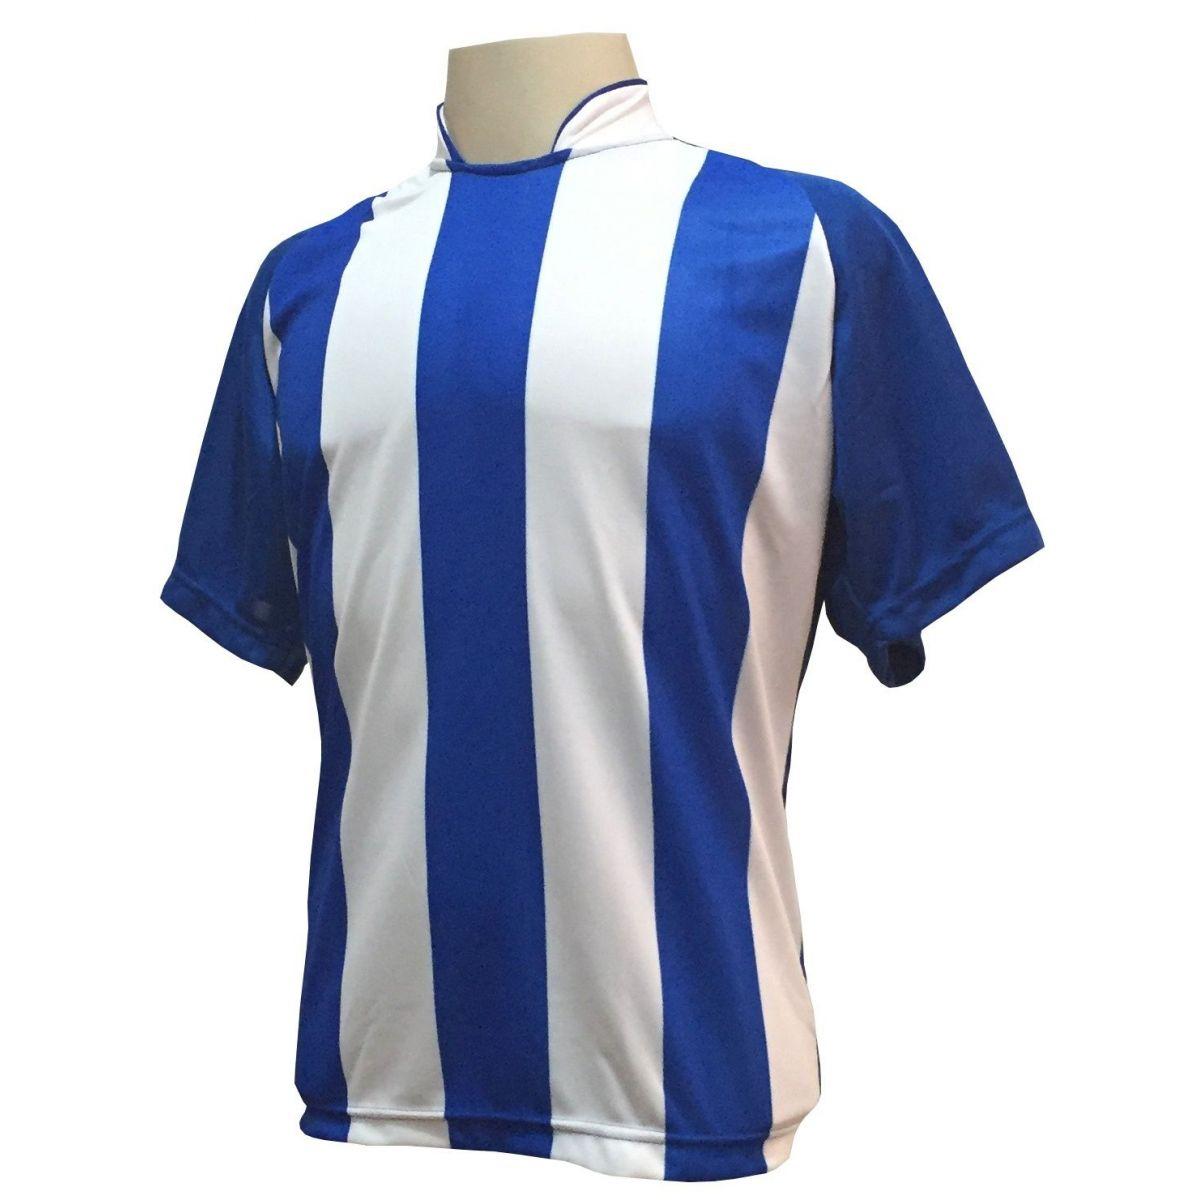 Jogo de Camisa com 20 unidades modelo Milan Royal/Branco + 1 Goleiro + Brindes